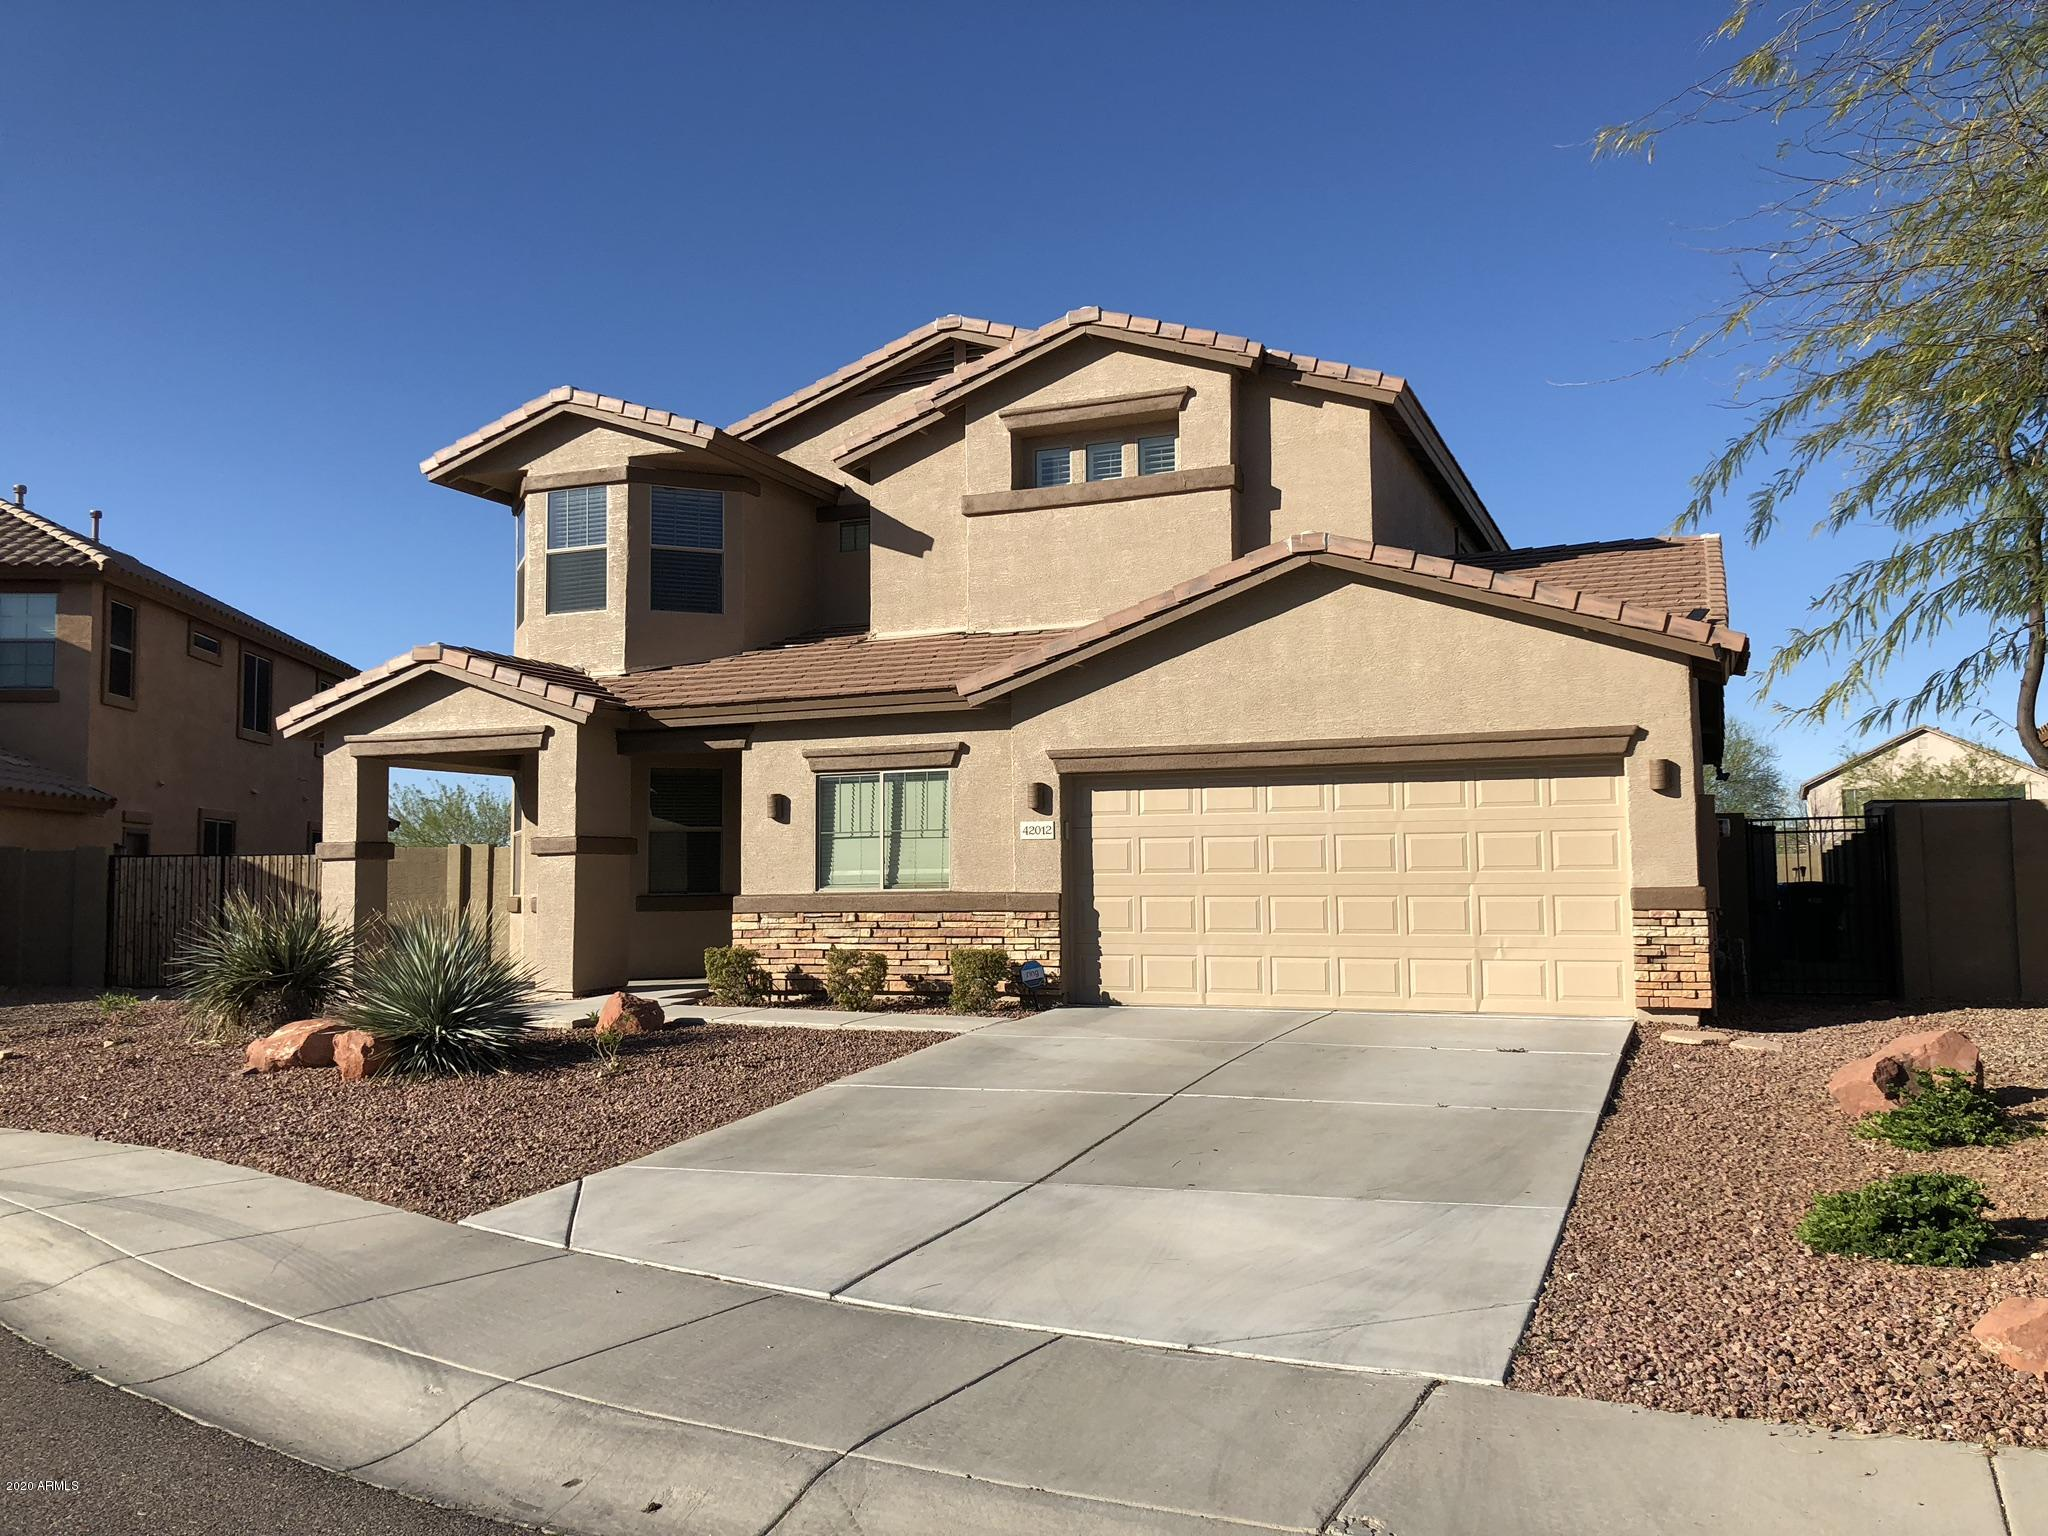 Photo for 42012 N 44th Drive, Phoenix, AZ 85086 (MLS # 6029740)